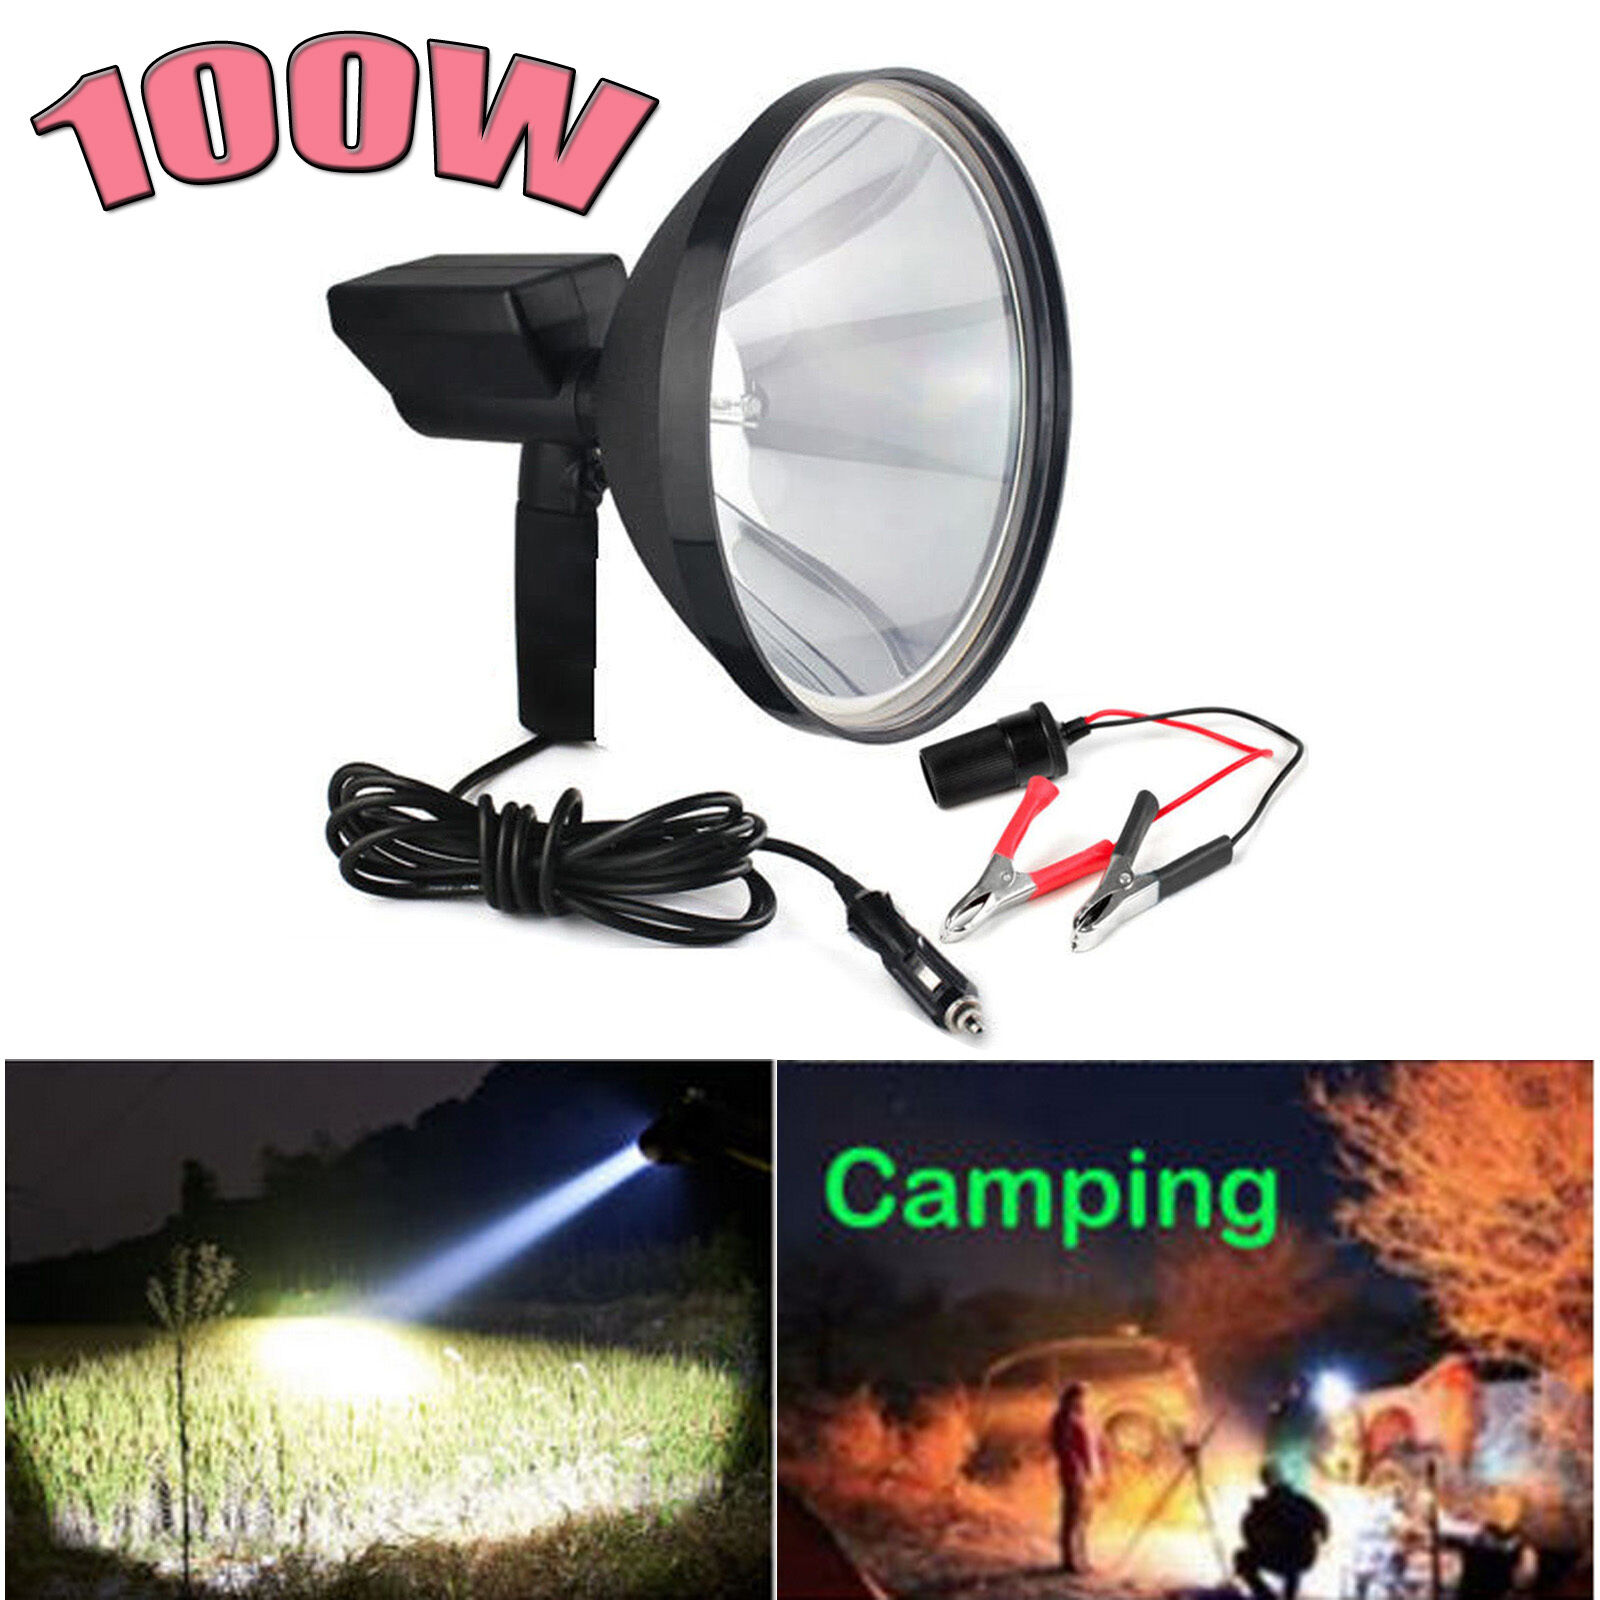 12V 9'' 100W HID Handheld Lamp Camping Hunting Fishing  Super Light Spotlights  low-key luxury connotation